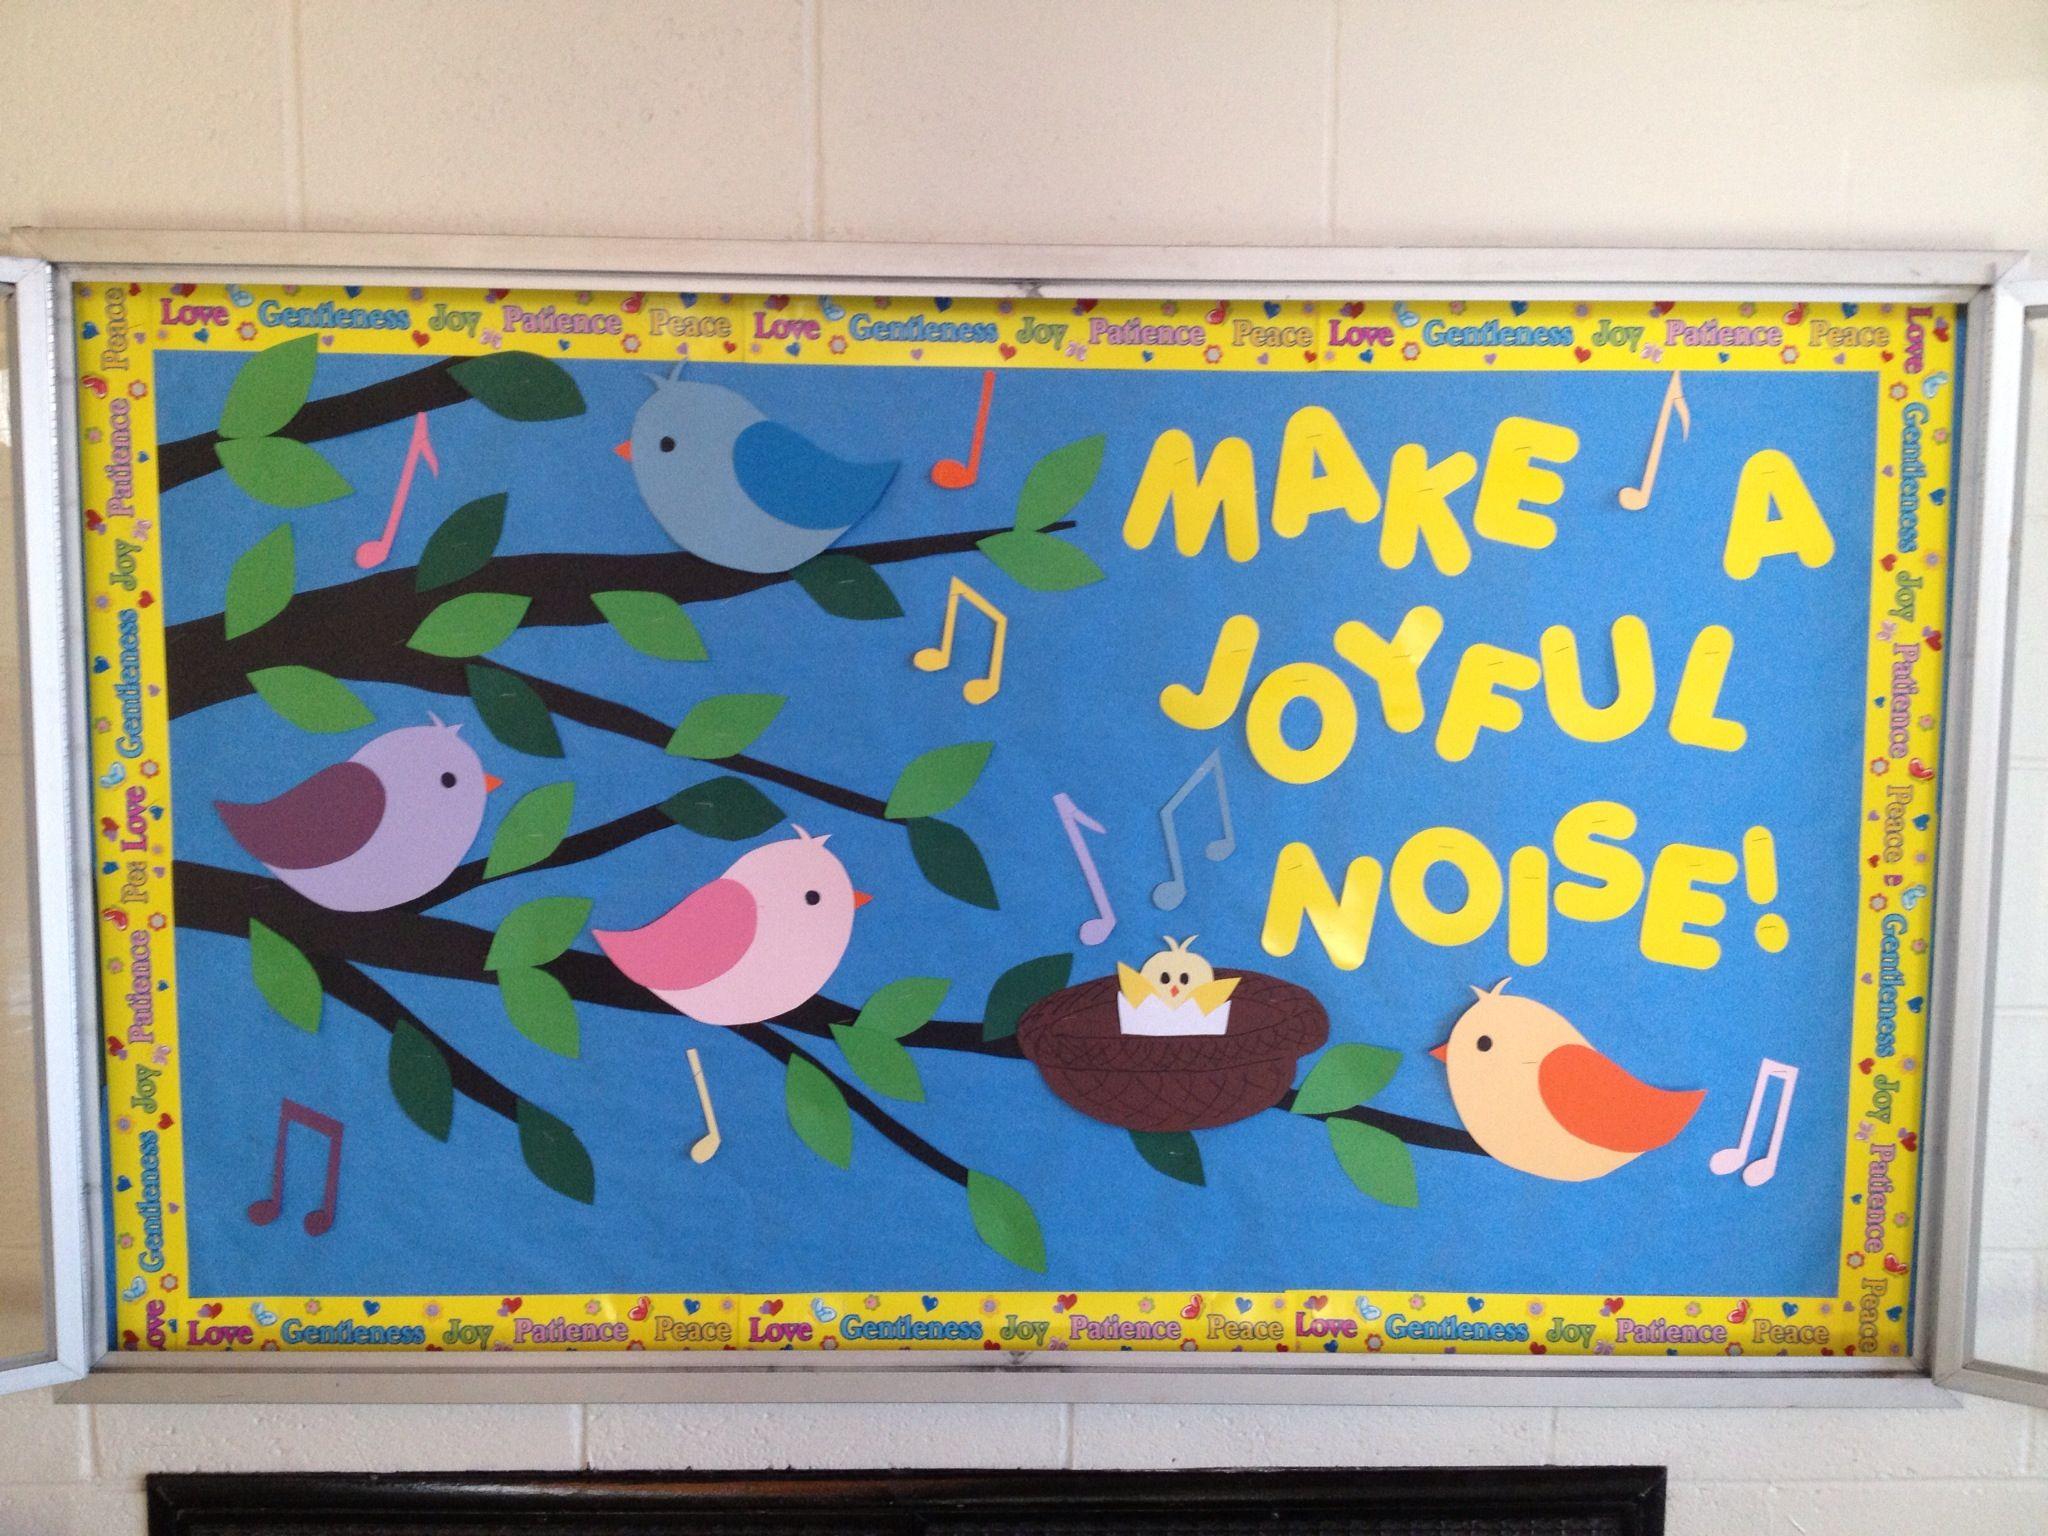 Classroom Decorations Bulletin Boards : Cool decoration ideas for school bulletin